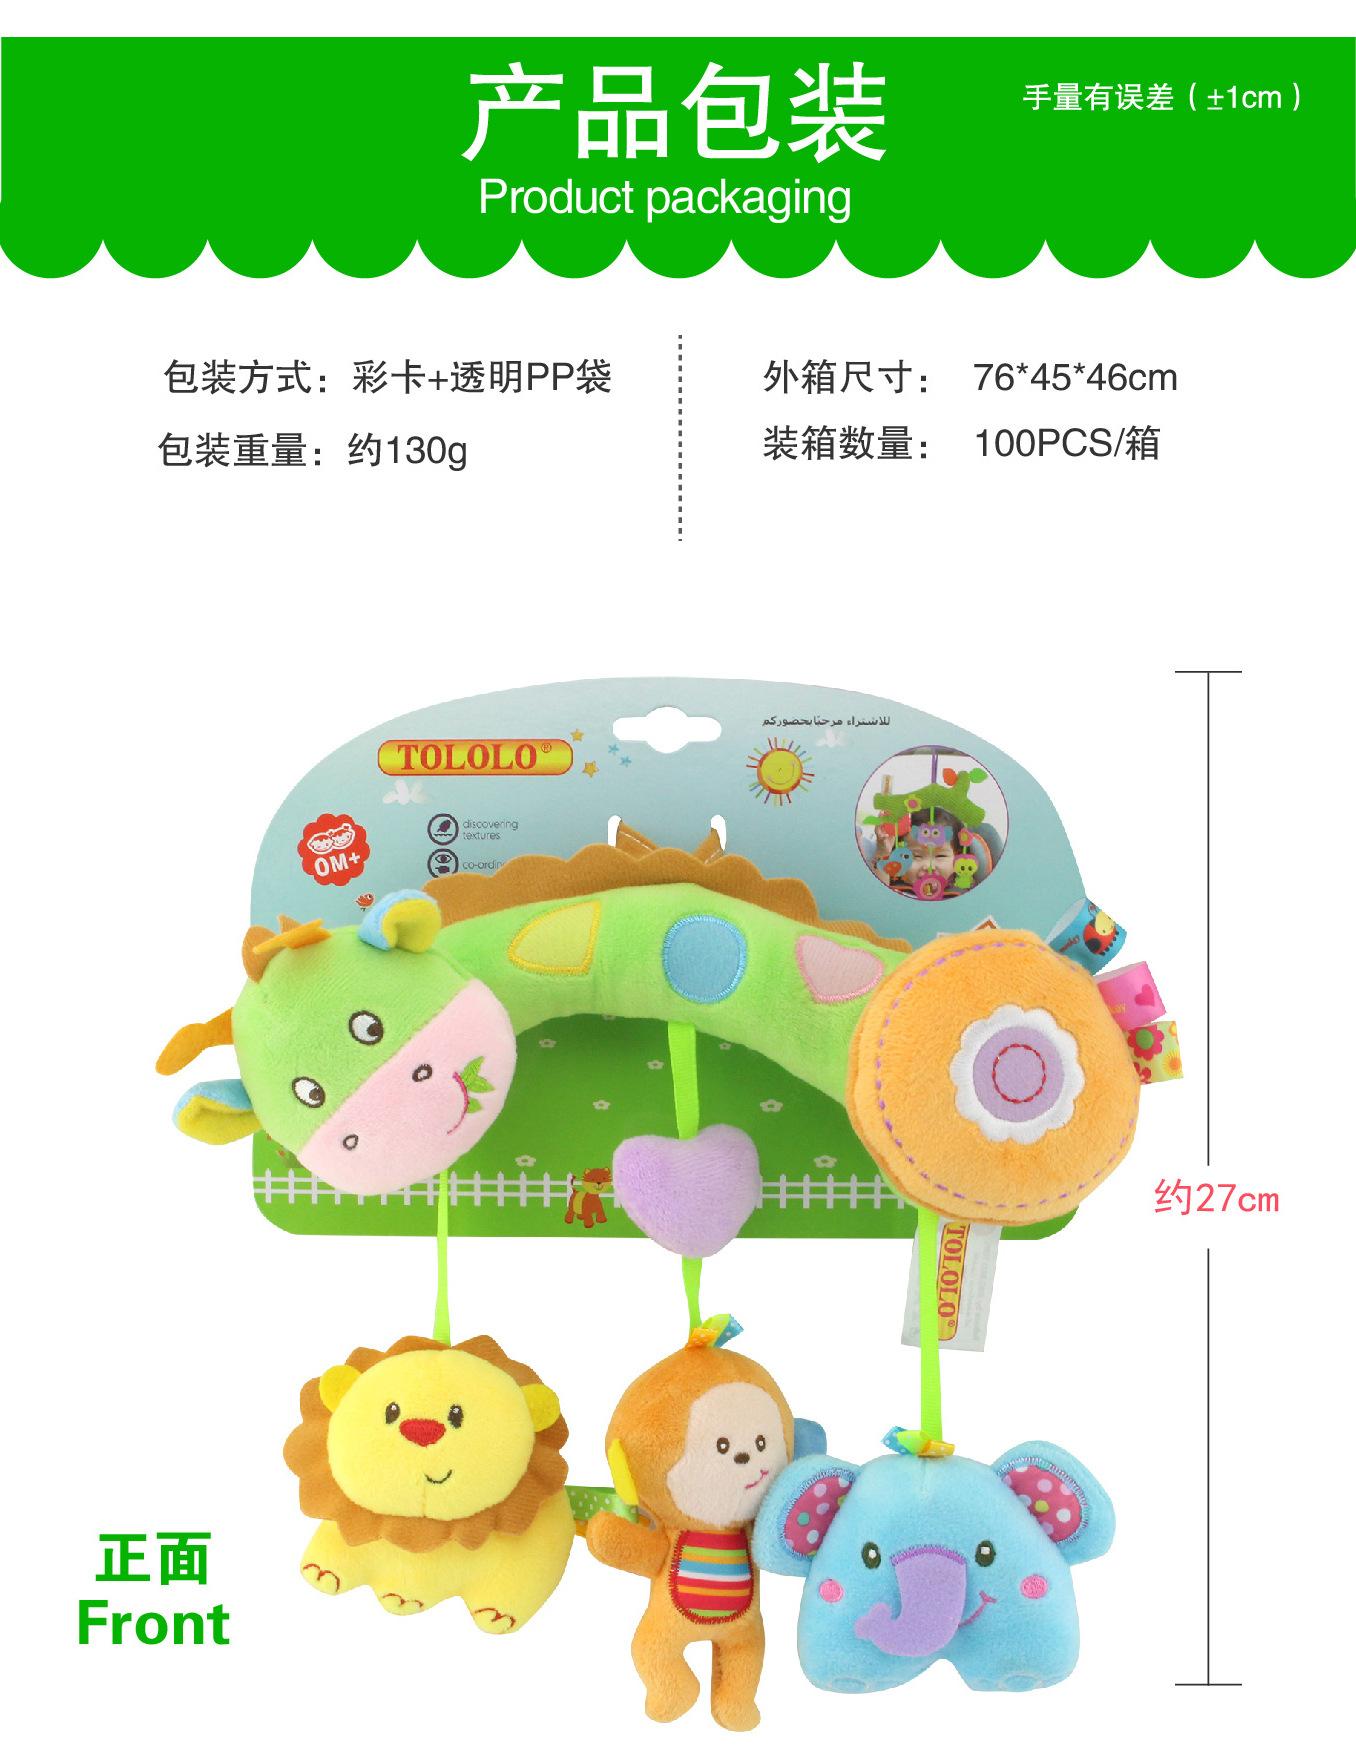 1 Free Newborn Baby Toy Trolley Pendant Bars Pendant Bracelet